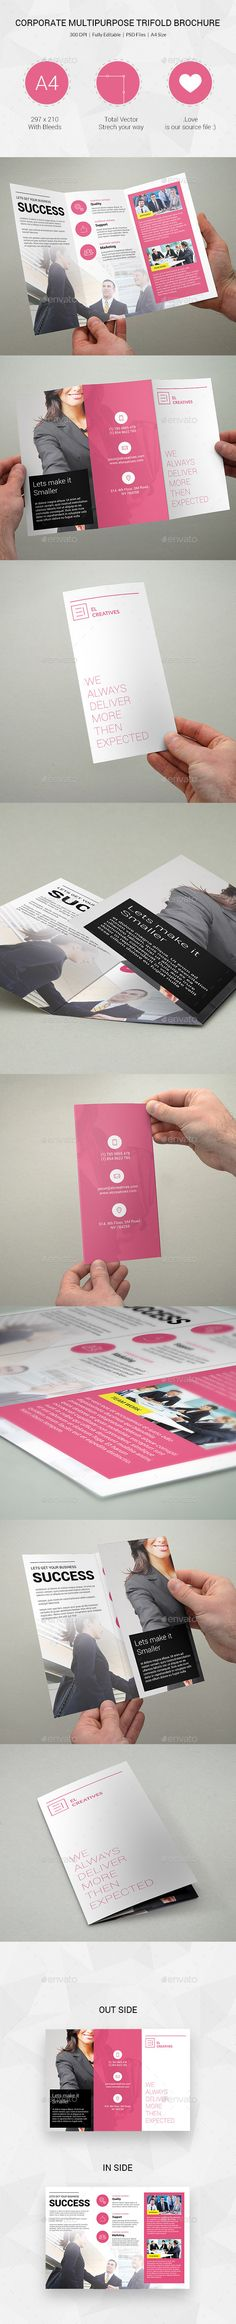 Businss Trifold Brochure Template #design #printdesign Download: http://graphicriver.net/item/businss-trifold-brochure-13/12090735?ref=ksioks